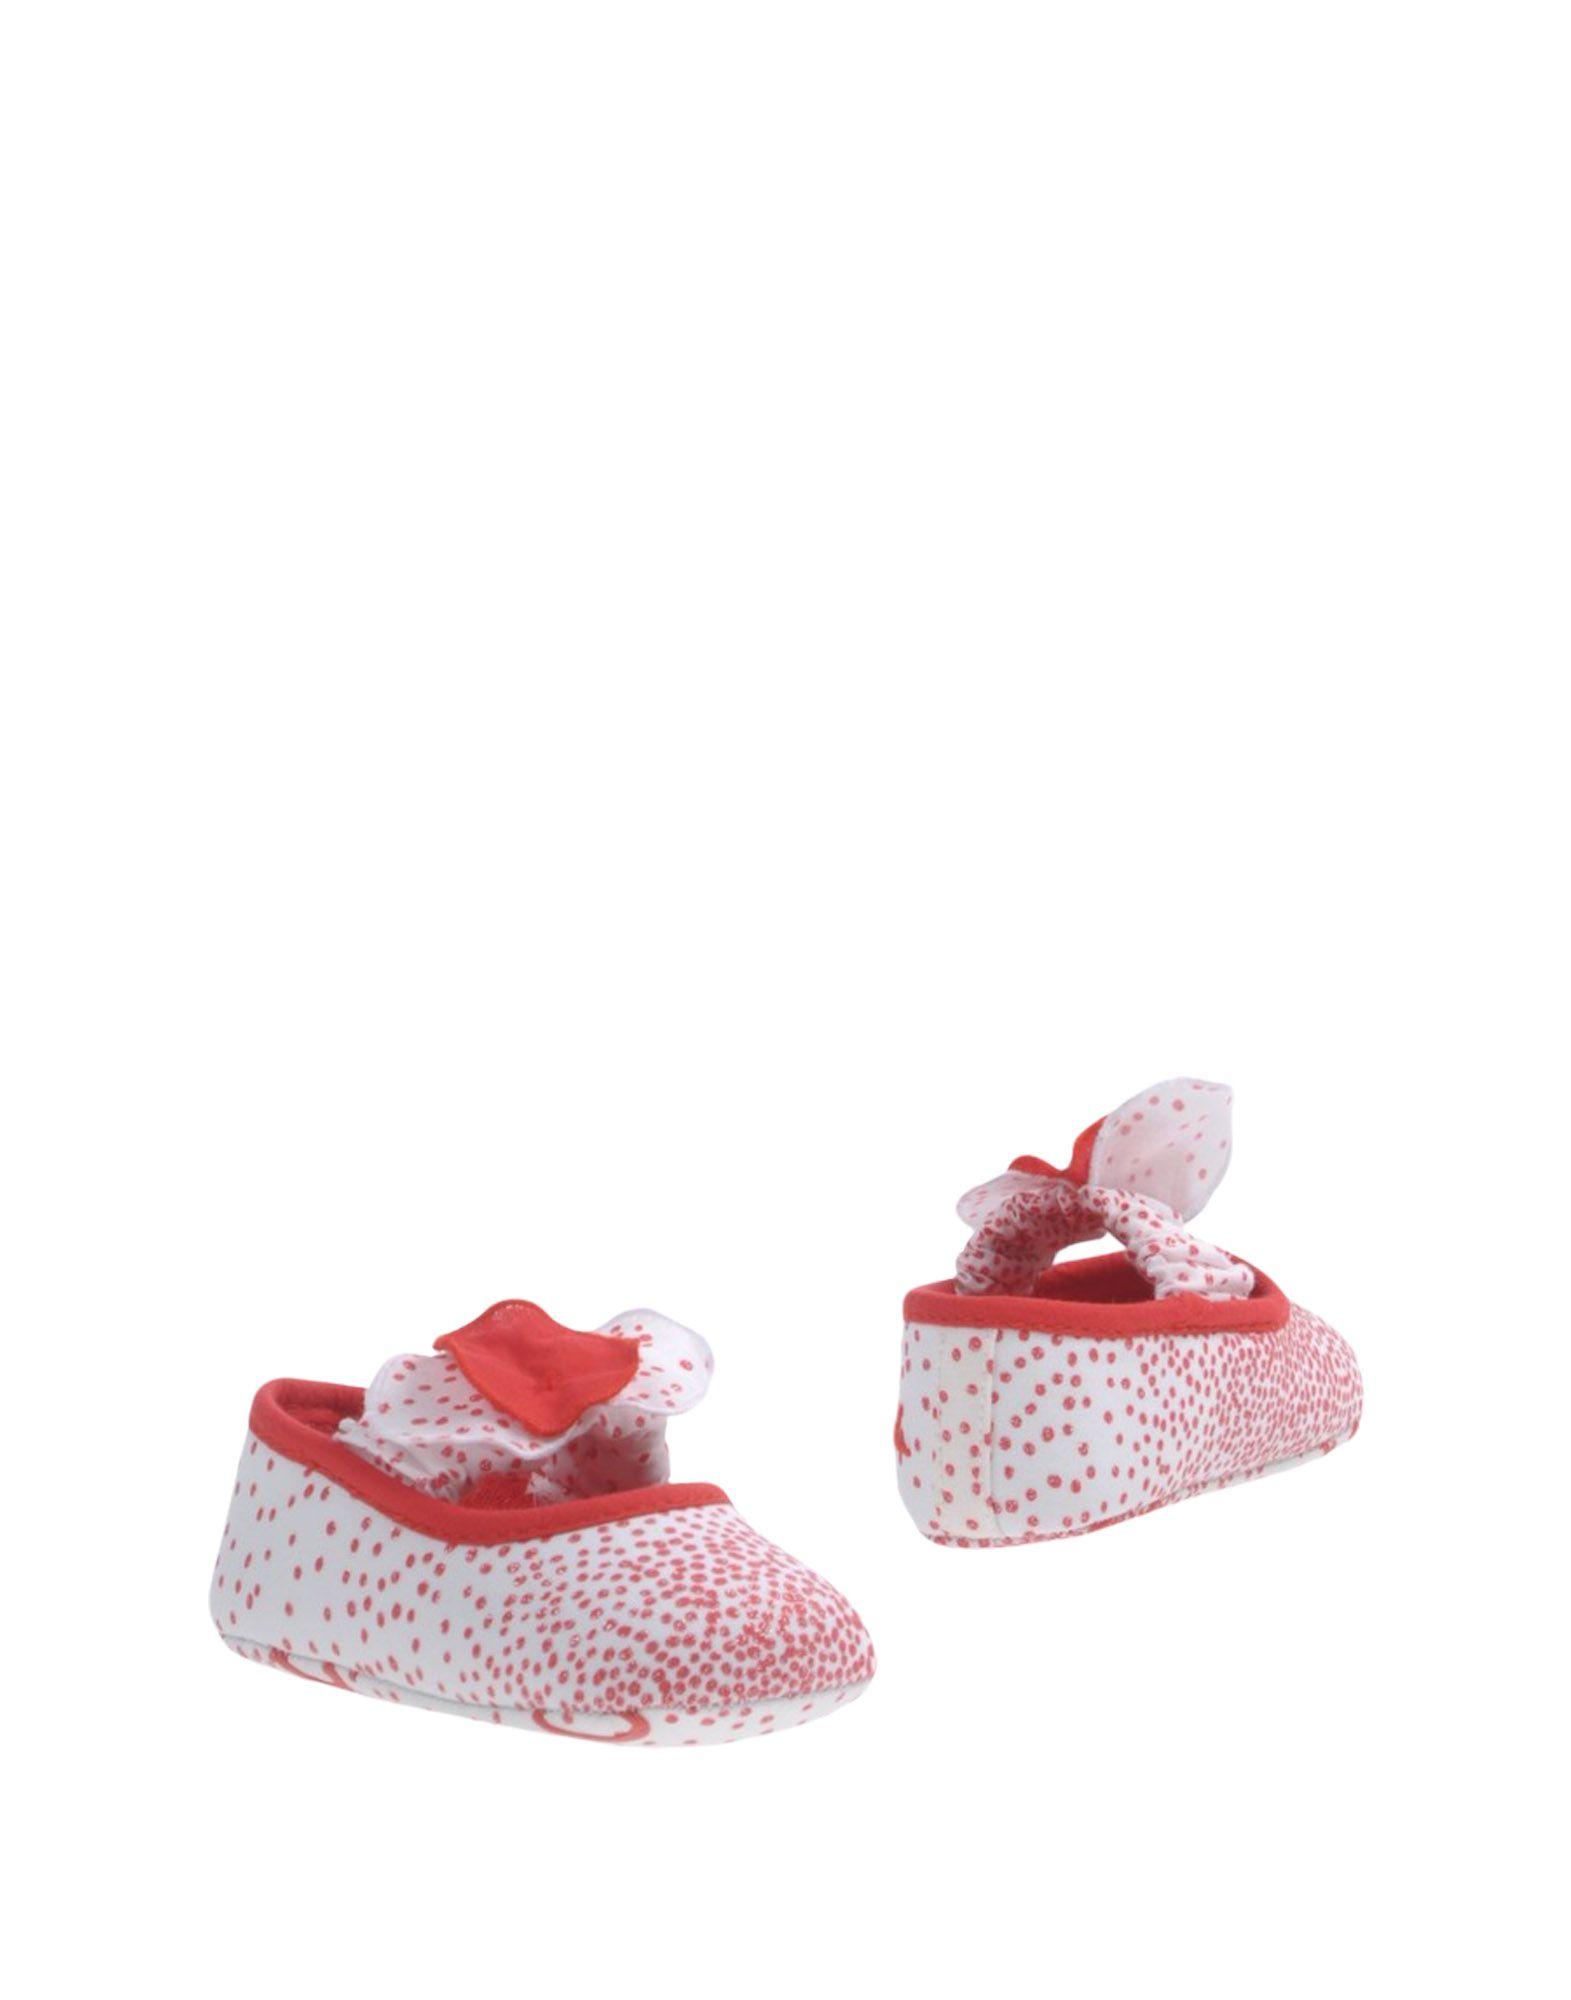 AGATHA RUIZ DE LA PRADA BABY Обувь для новорожденных agatha ruiz de la prada легинсы